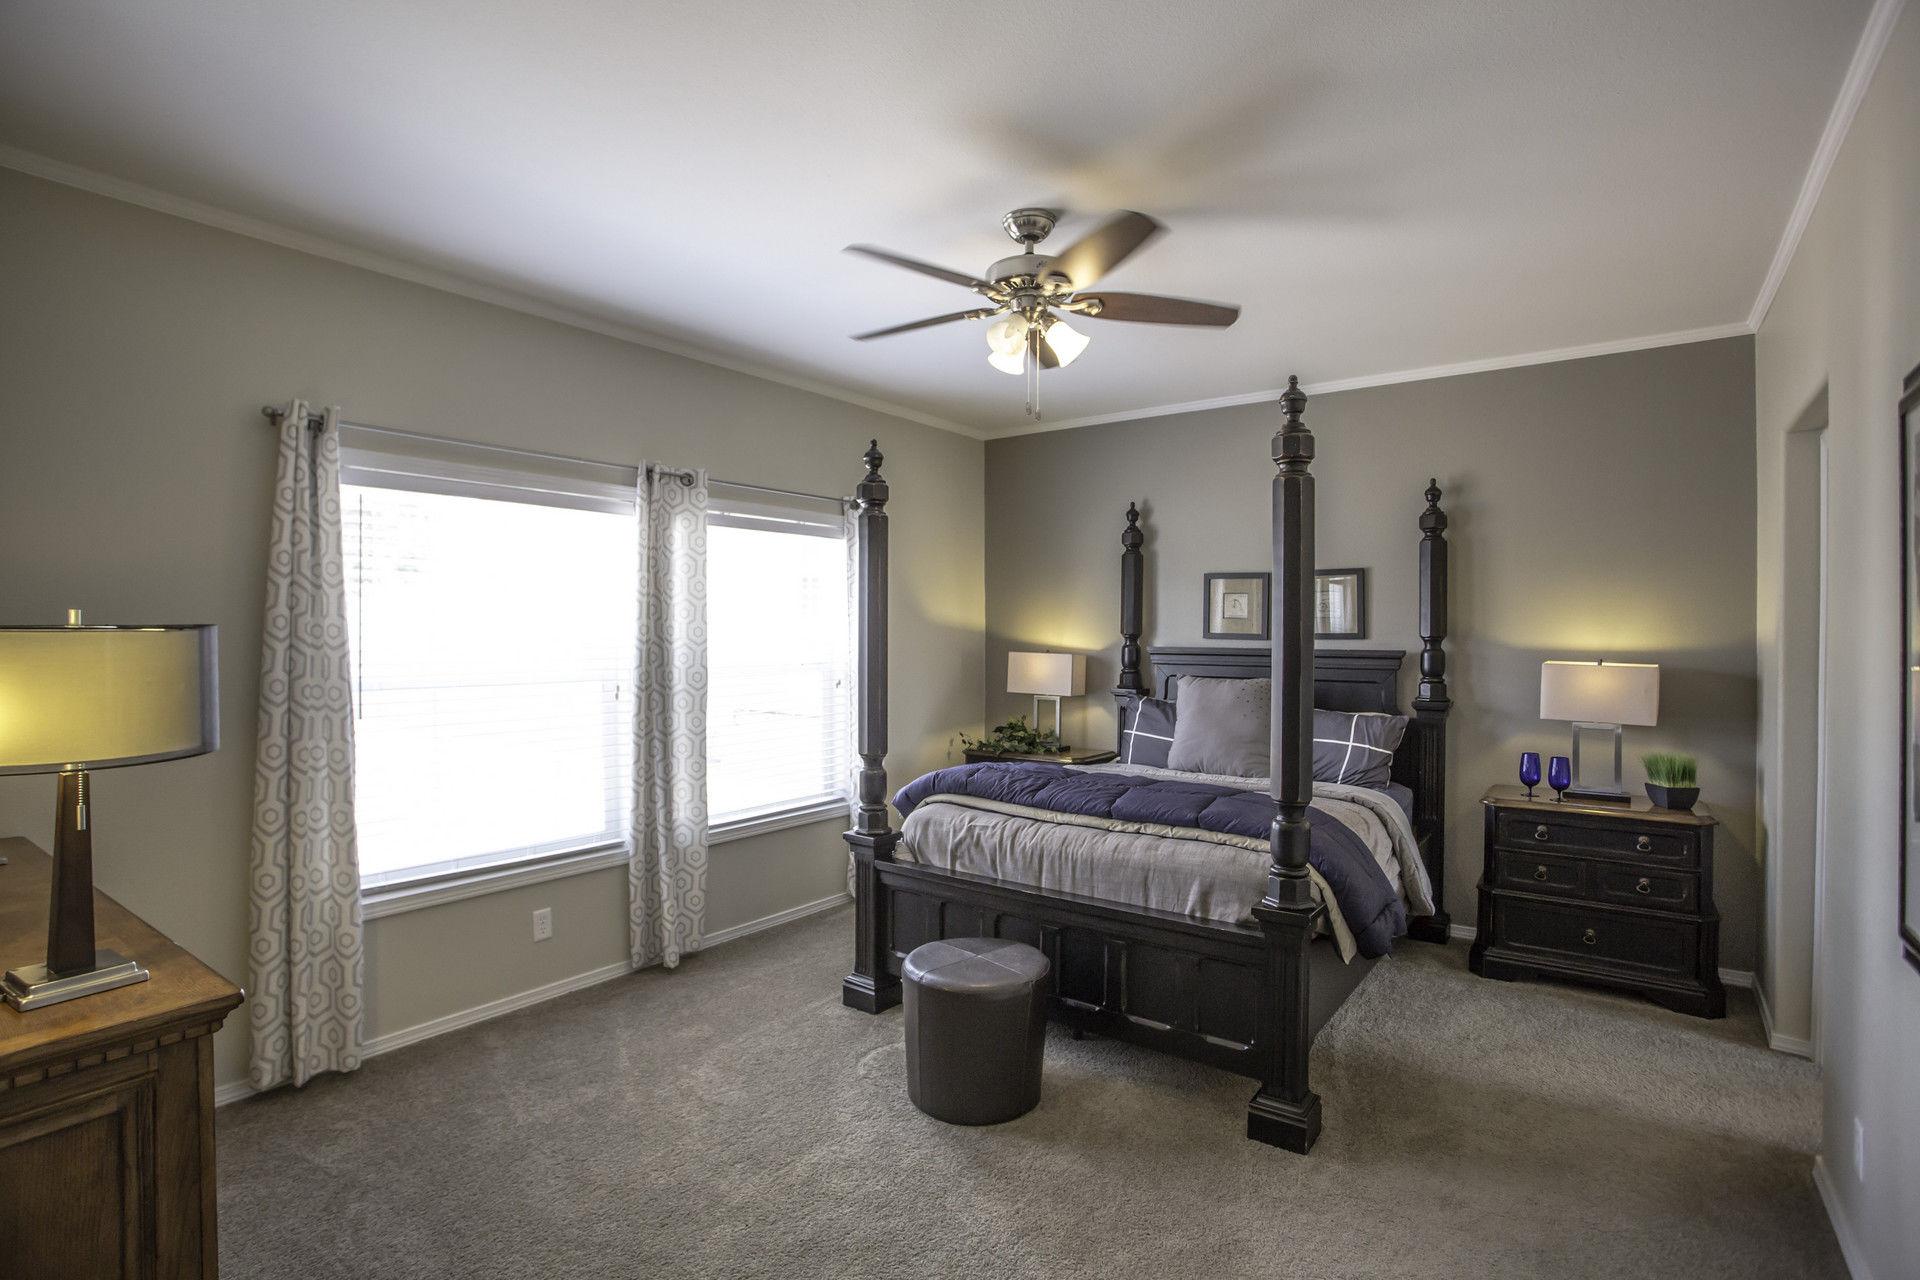 1 Bedroom Modular Homes